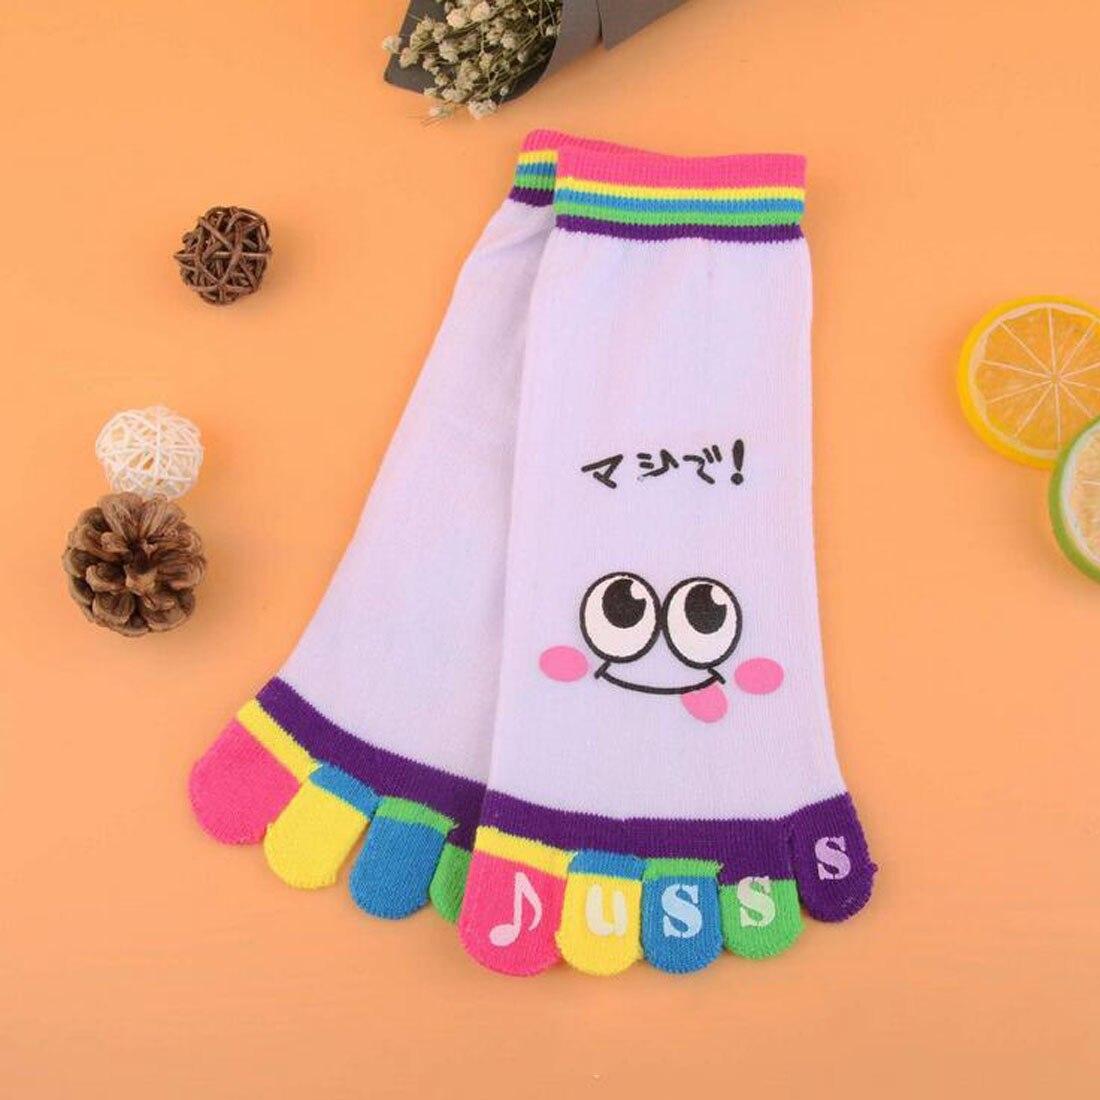 1 Pair Top Sell Womens Cute Casual Five Toe Crew Finger Performance Original Weight Micro Toe Cotton Socks